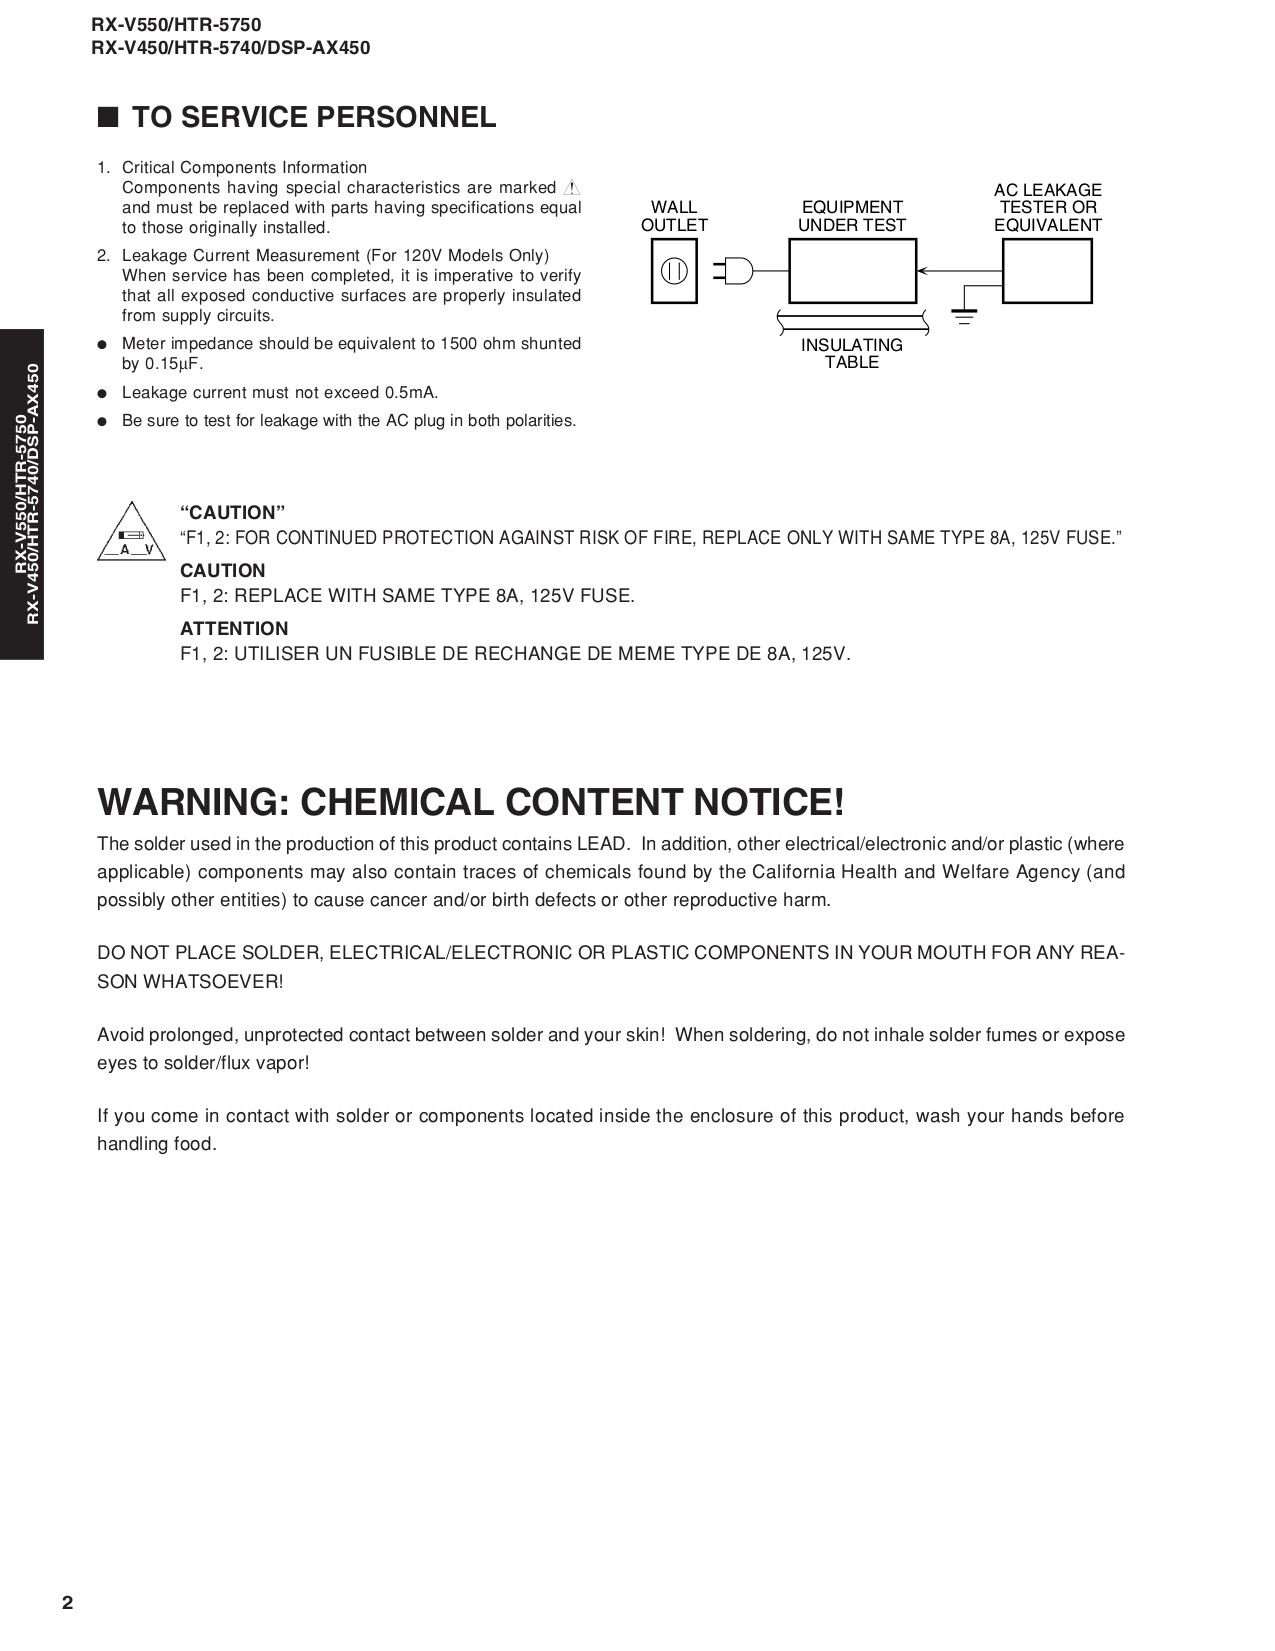 PDF manual for Yamaha Receiver RX-V450